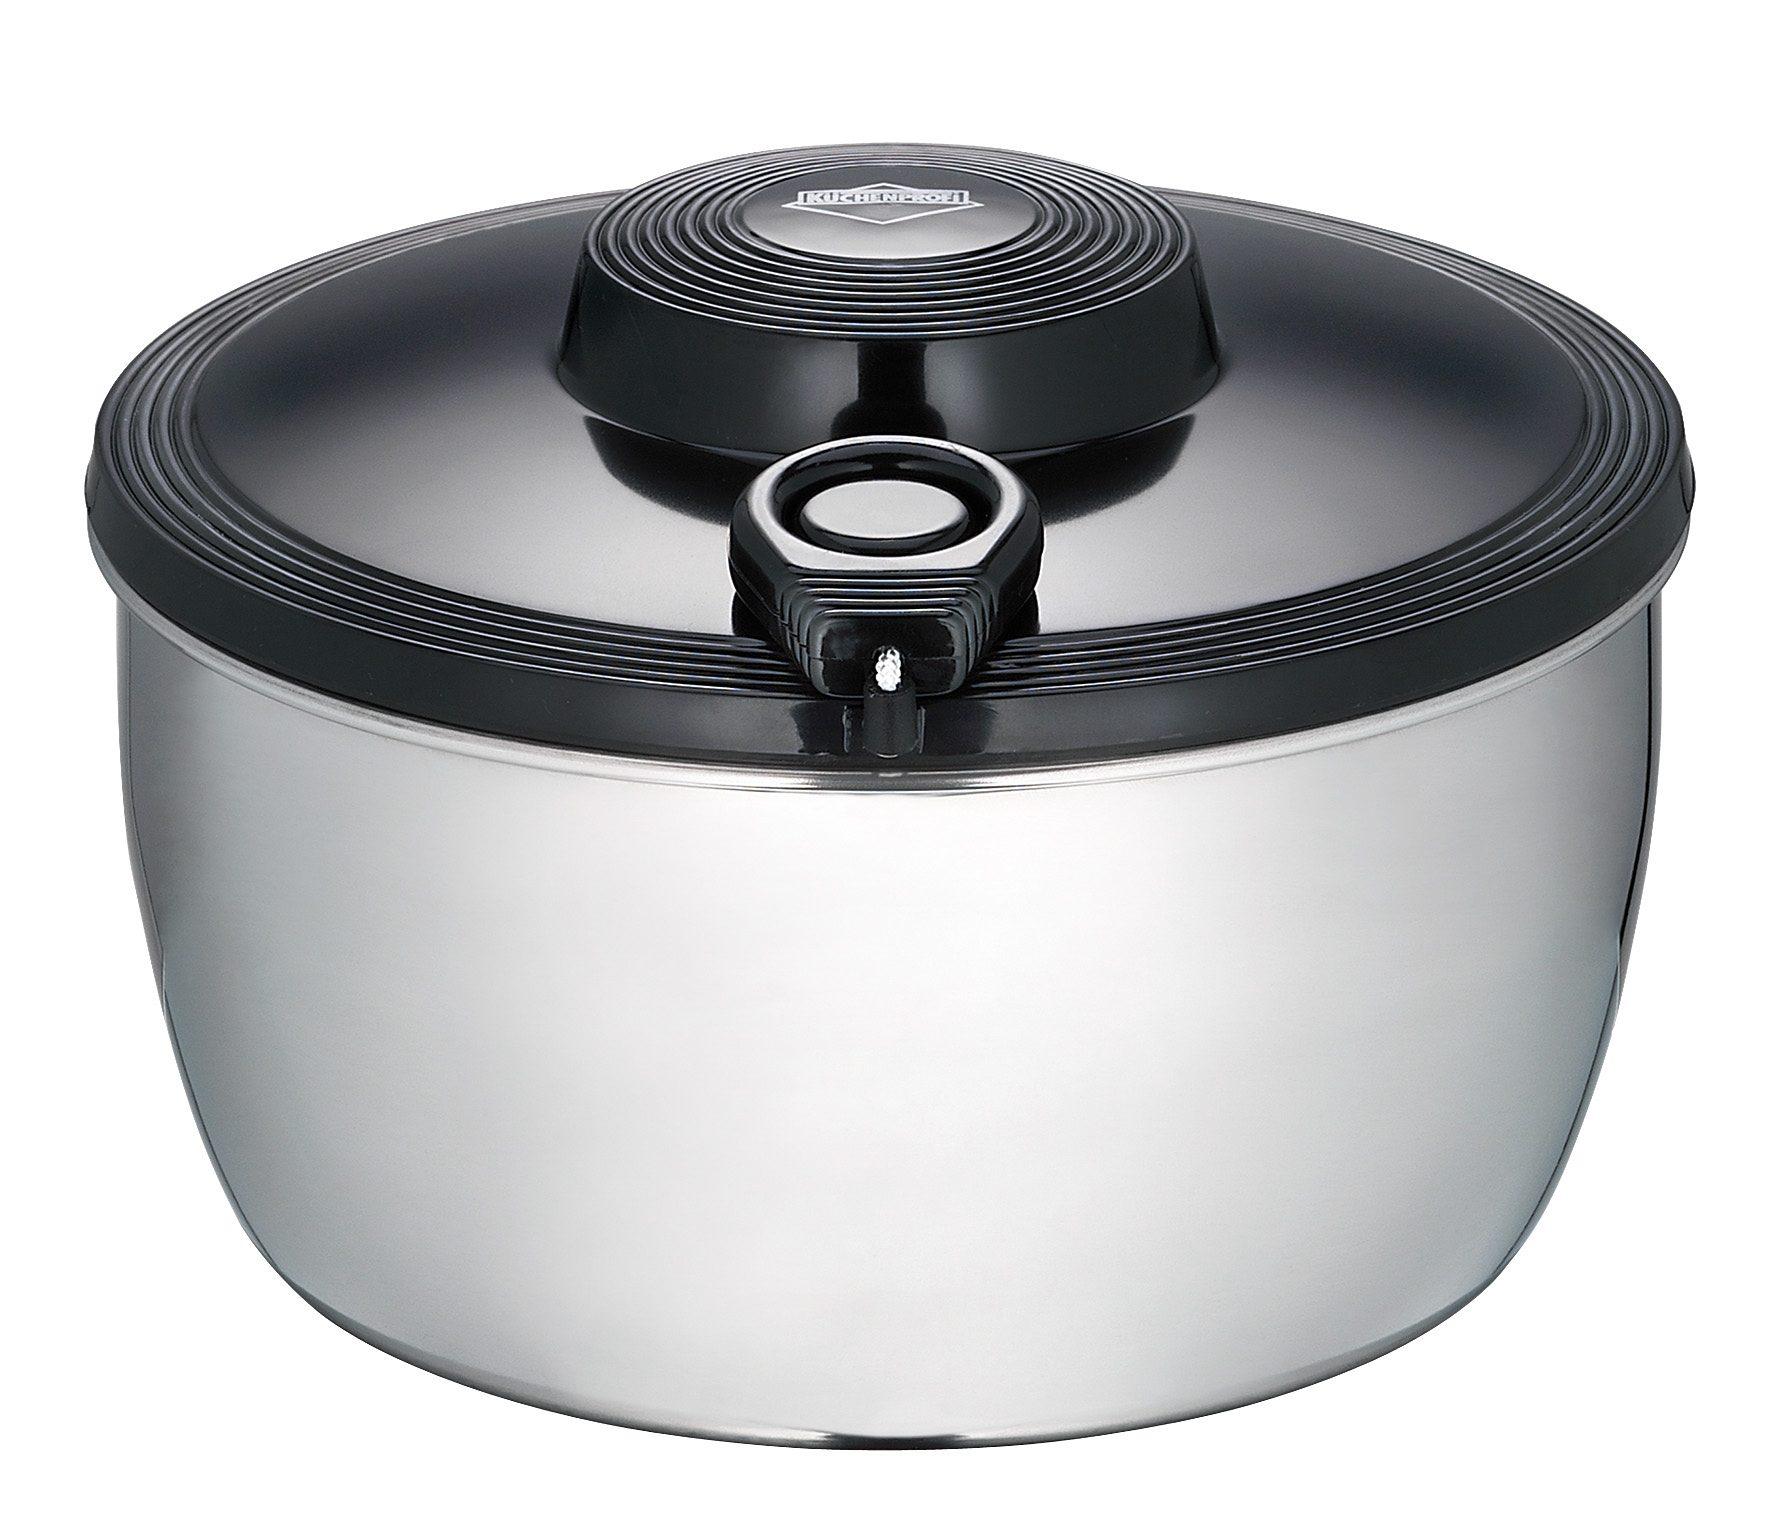 Küchenprofi Salatschleuder Edelstahl